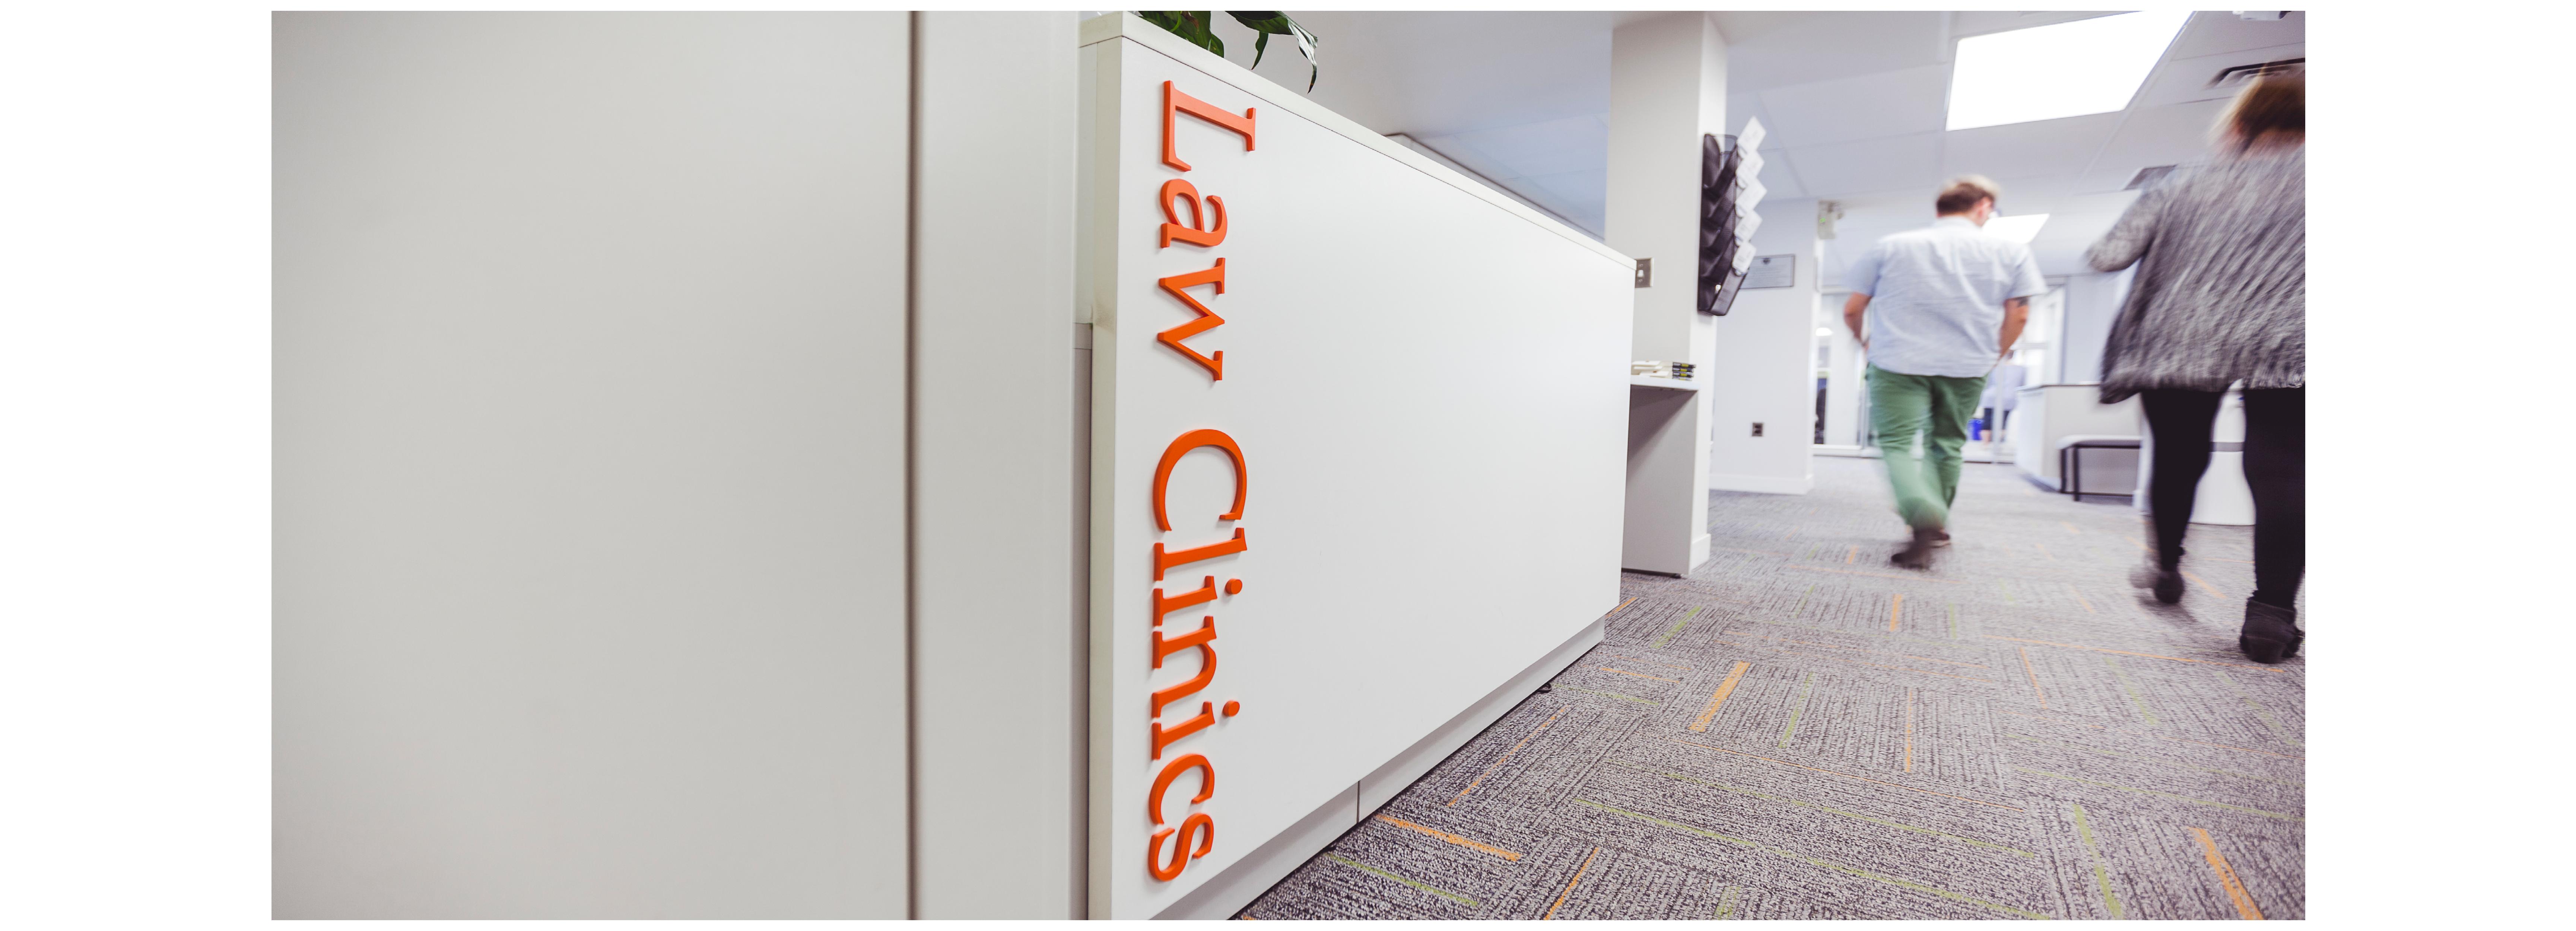 Queen's Law Clinics image